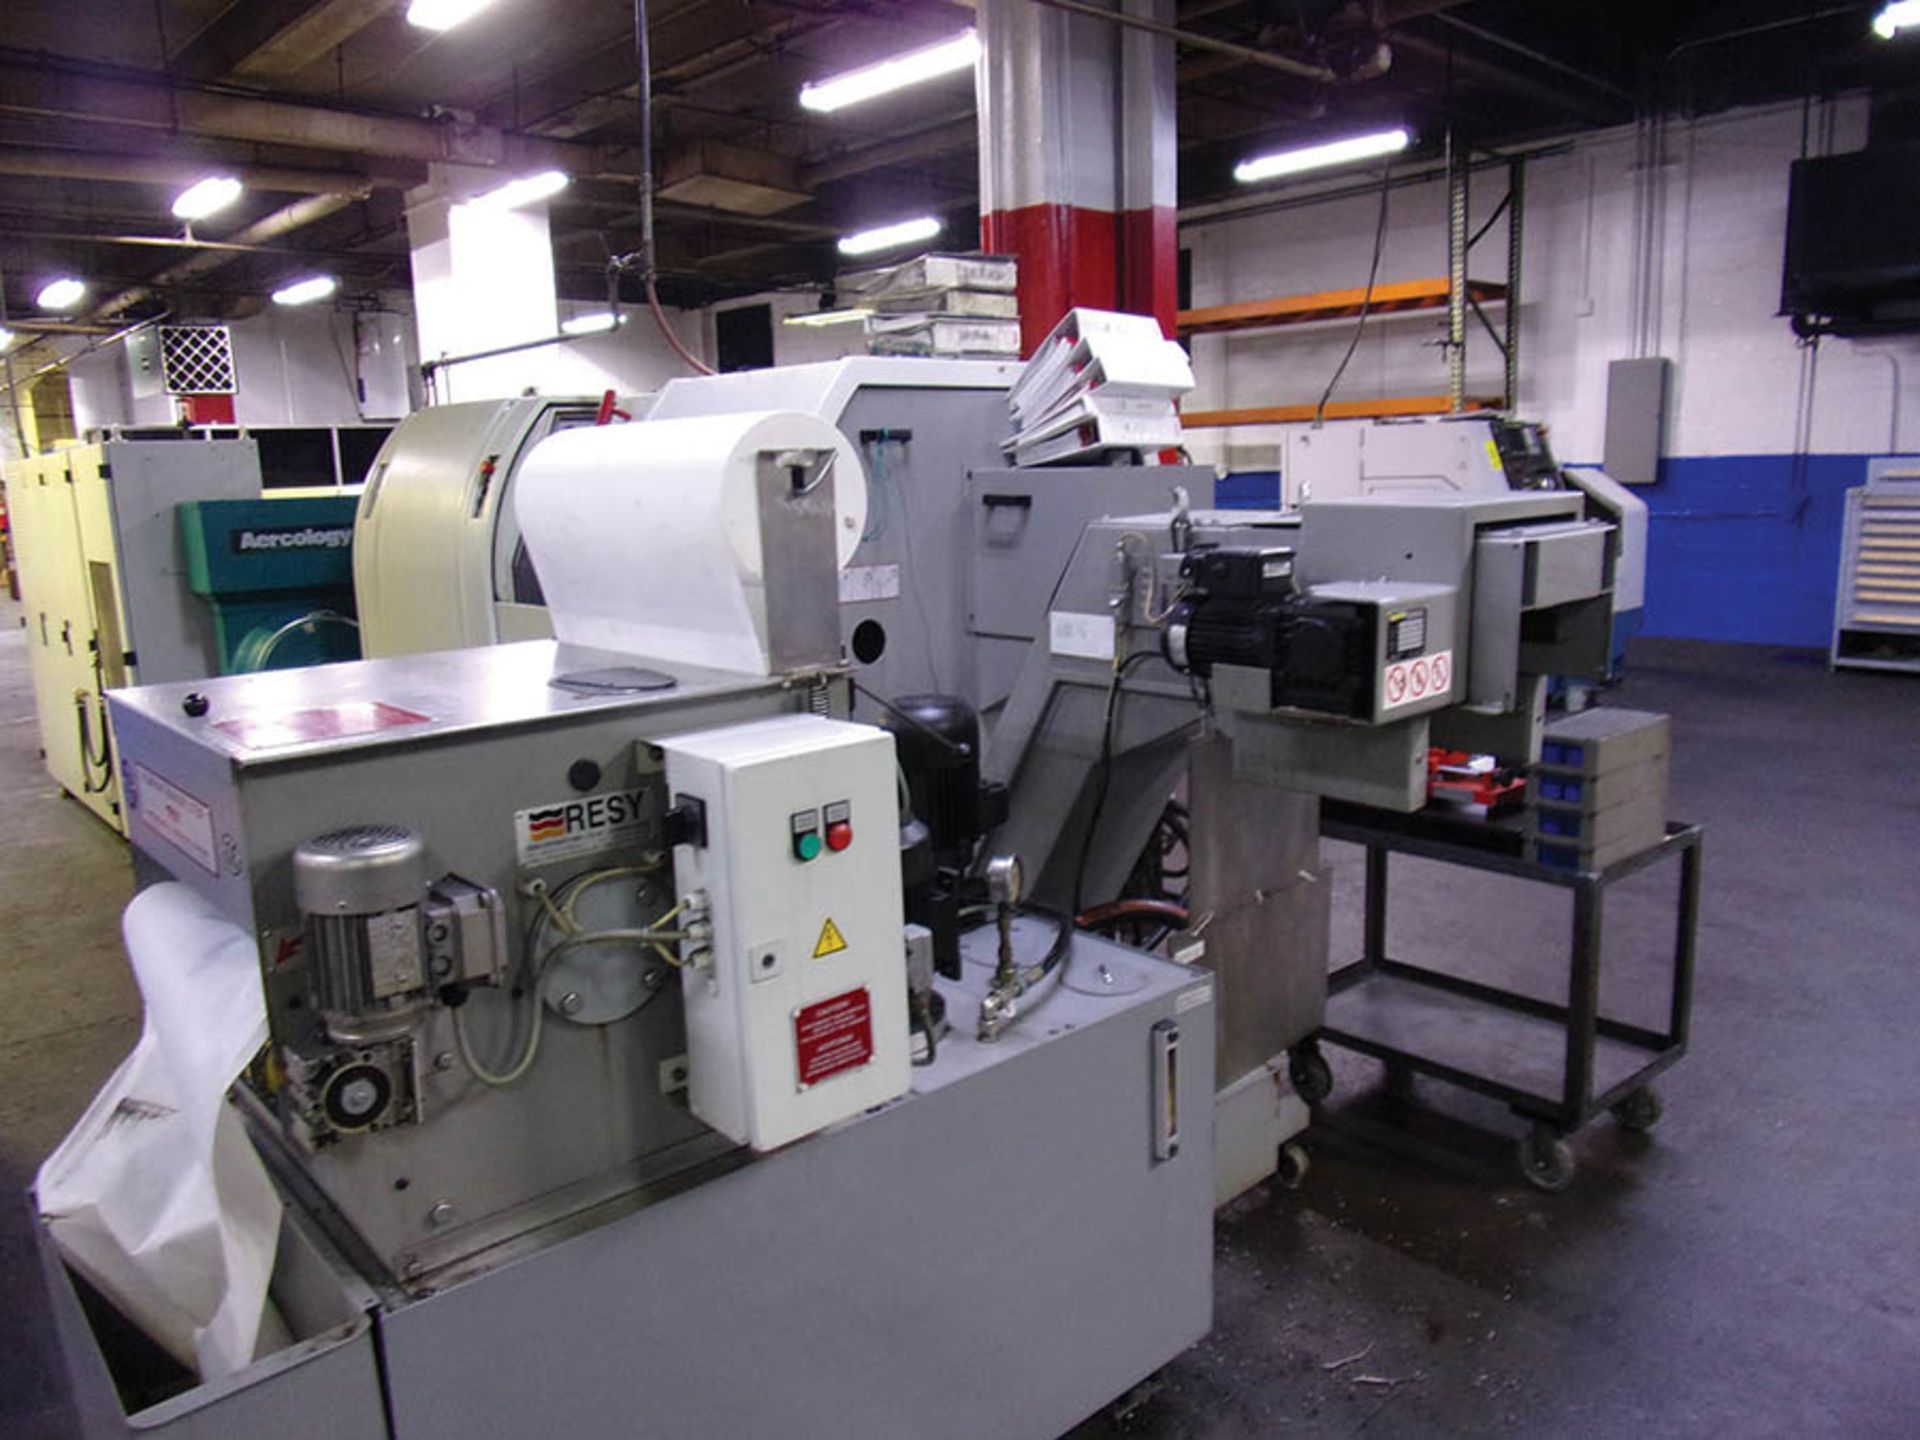 Lot 710 - 2006 TRAUB TNL-26 SWISS TYPE CNC SCREW MACHINE; TX-8I CONTROL, COLLET CHUCK, SUB SPINDLE, (2)